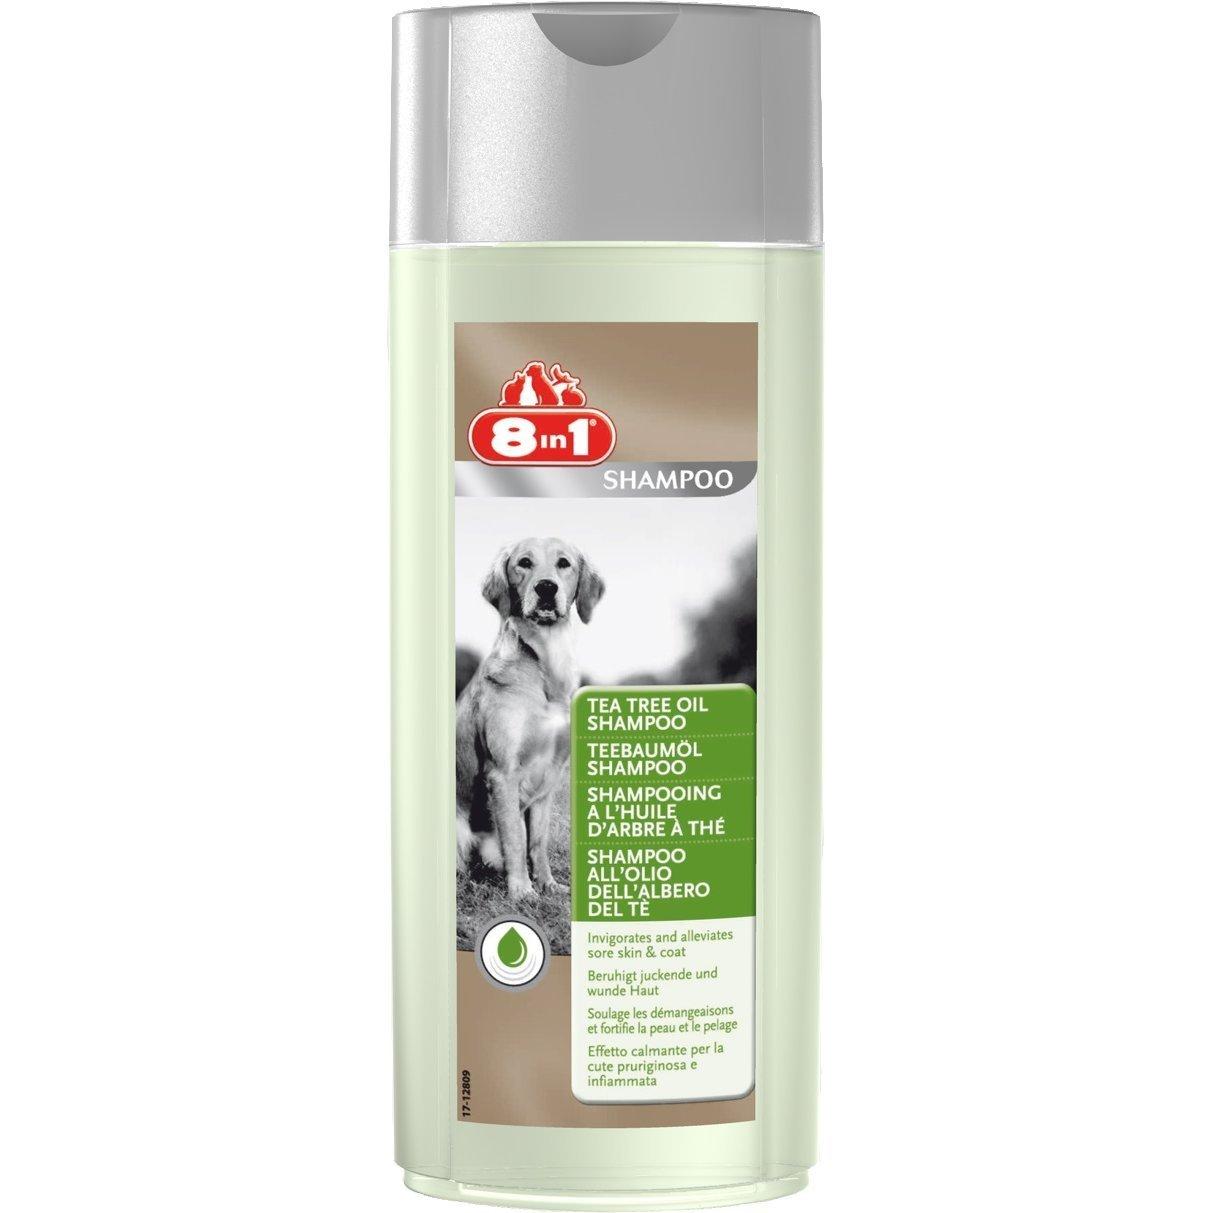 8in1 Teebaumöl Hunde Shampoo, 250 ml